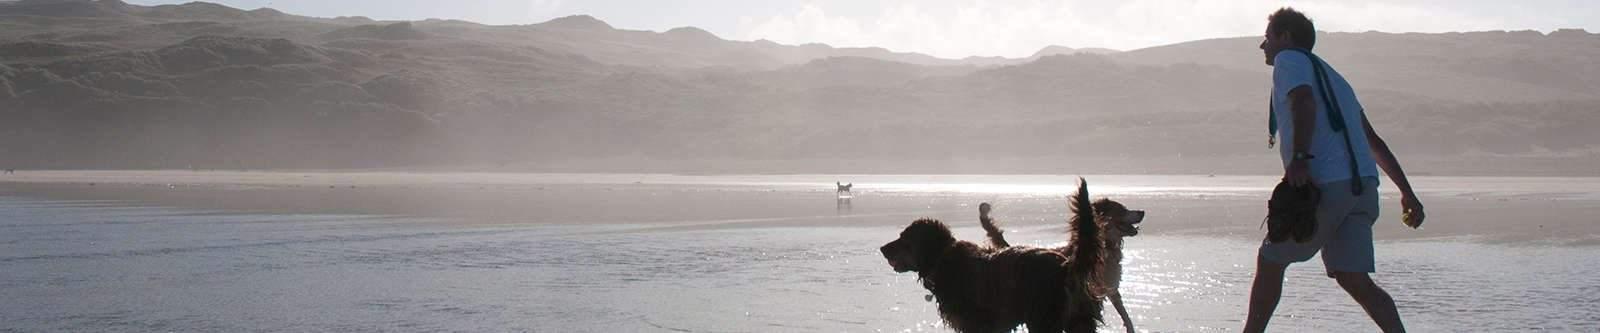 man walking dogs on beach